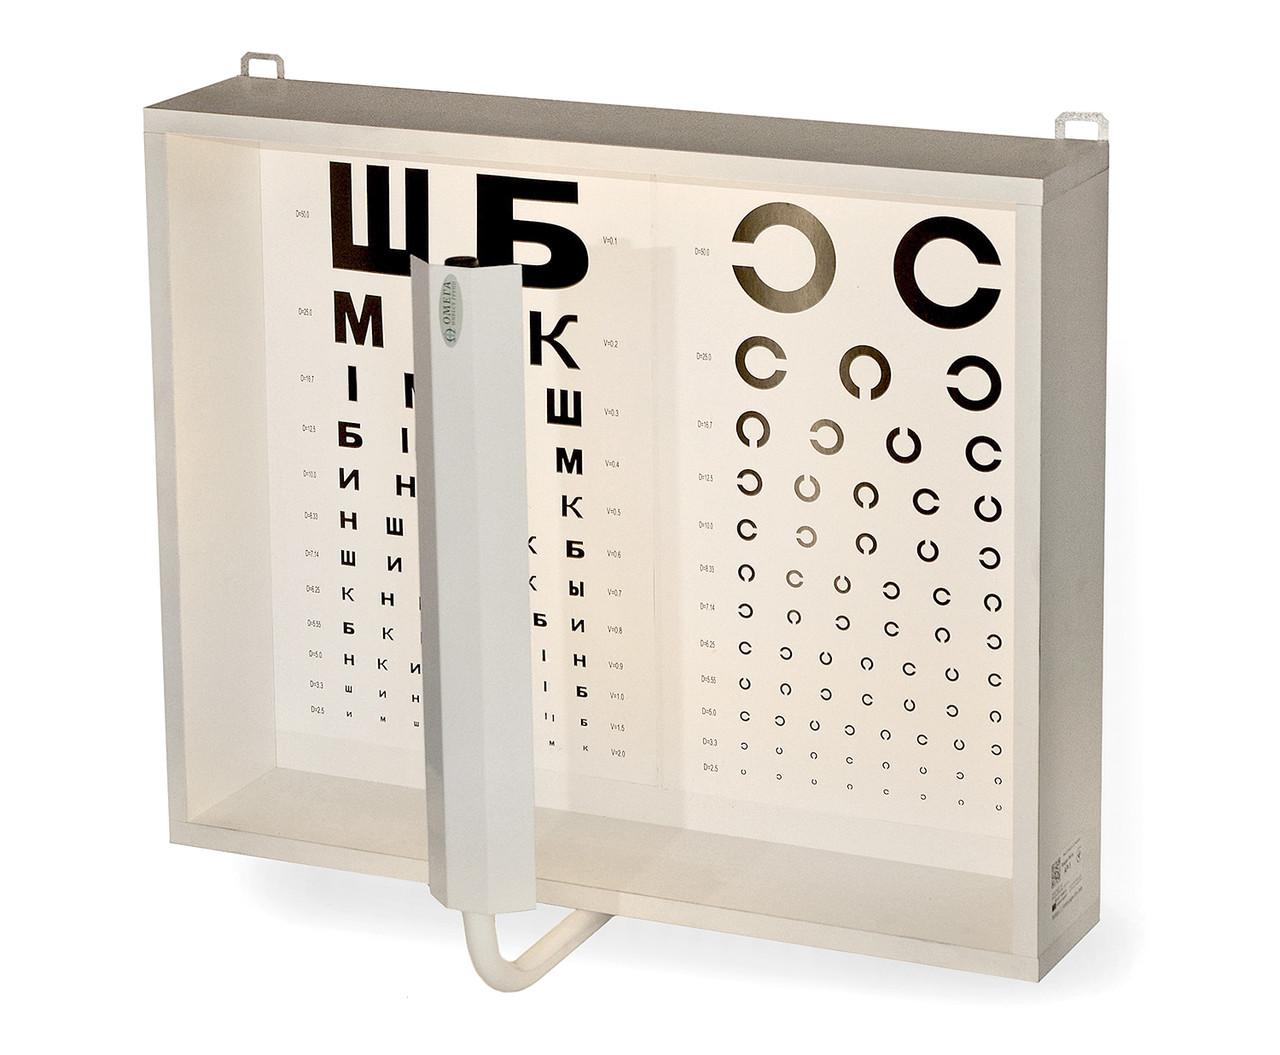 Осветитель таблиц для проверки зрения ар-1м медицинский (Аппарат Ротта АР-1)